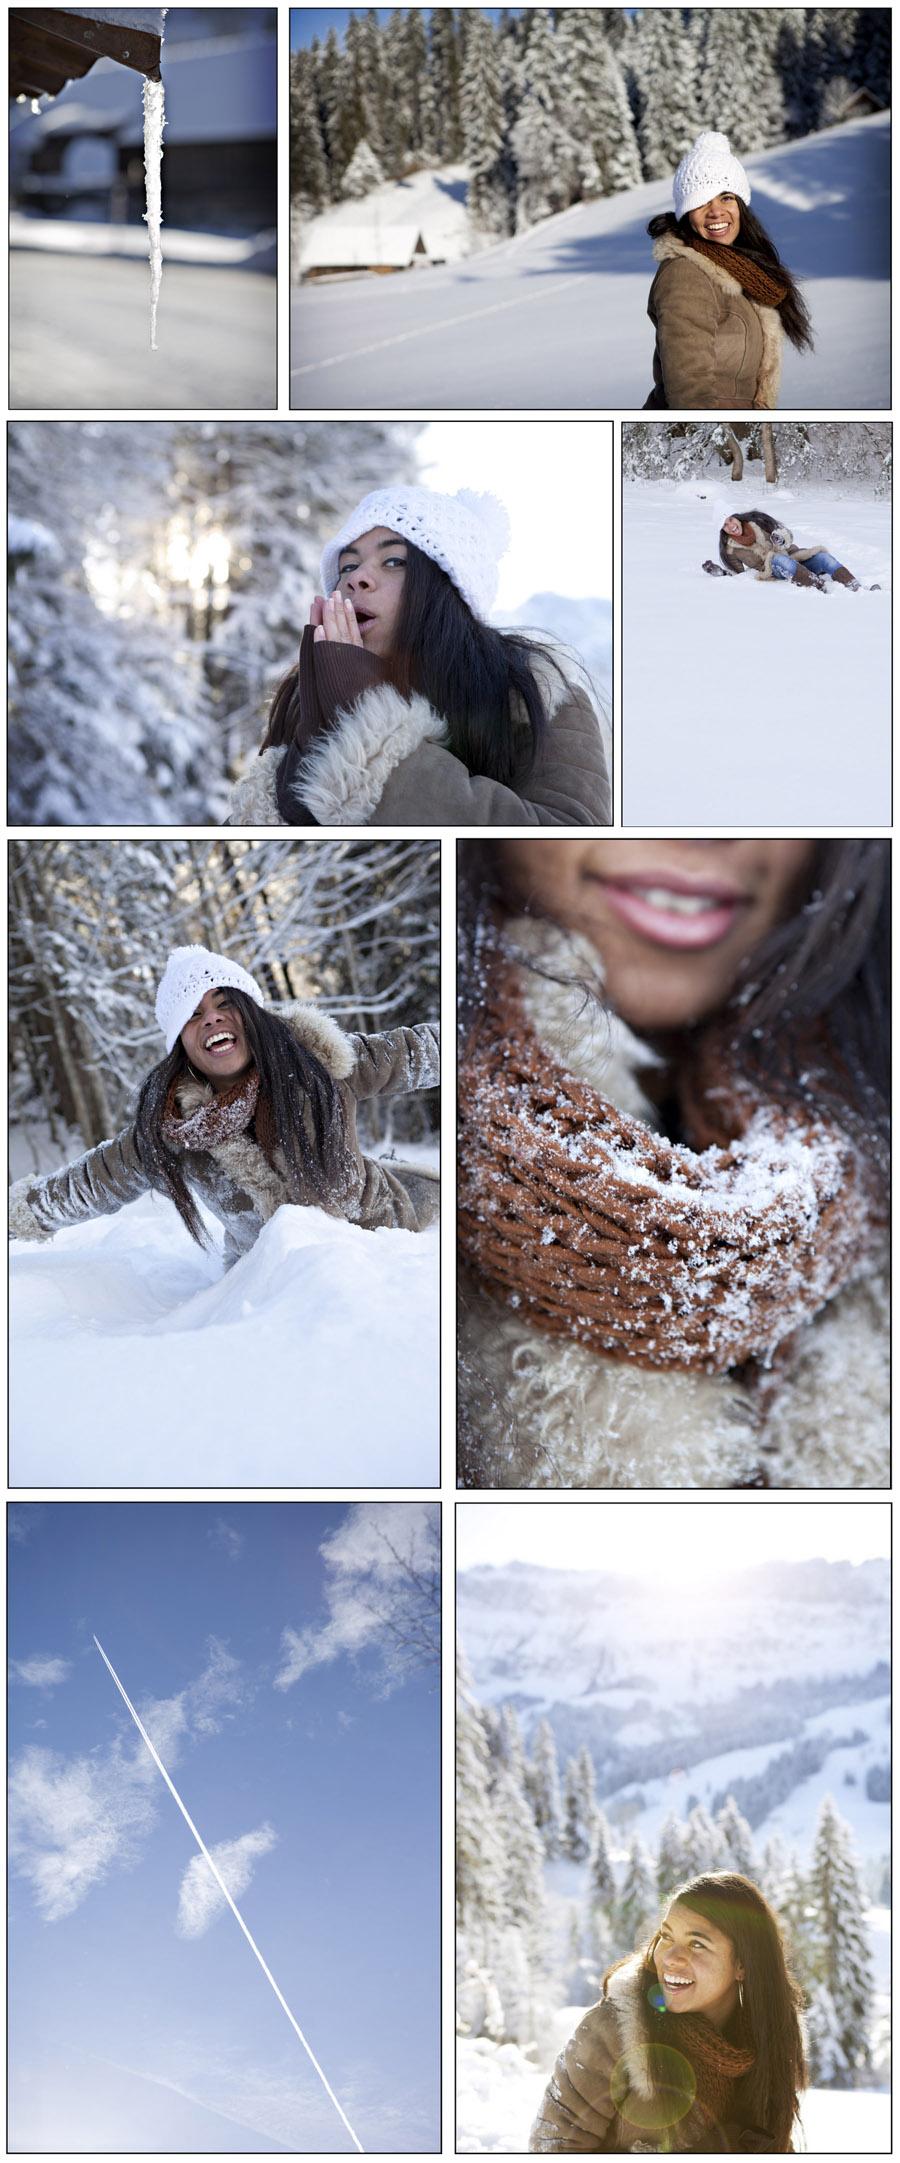 deux_hiver1jpg